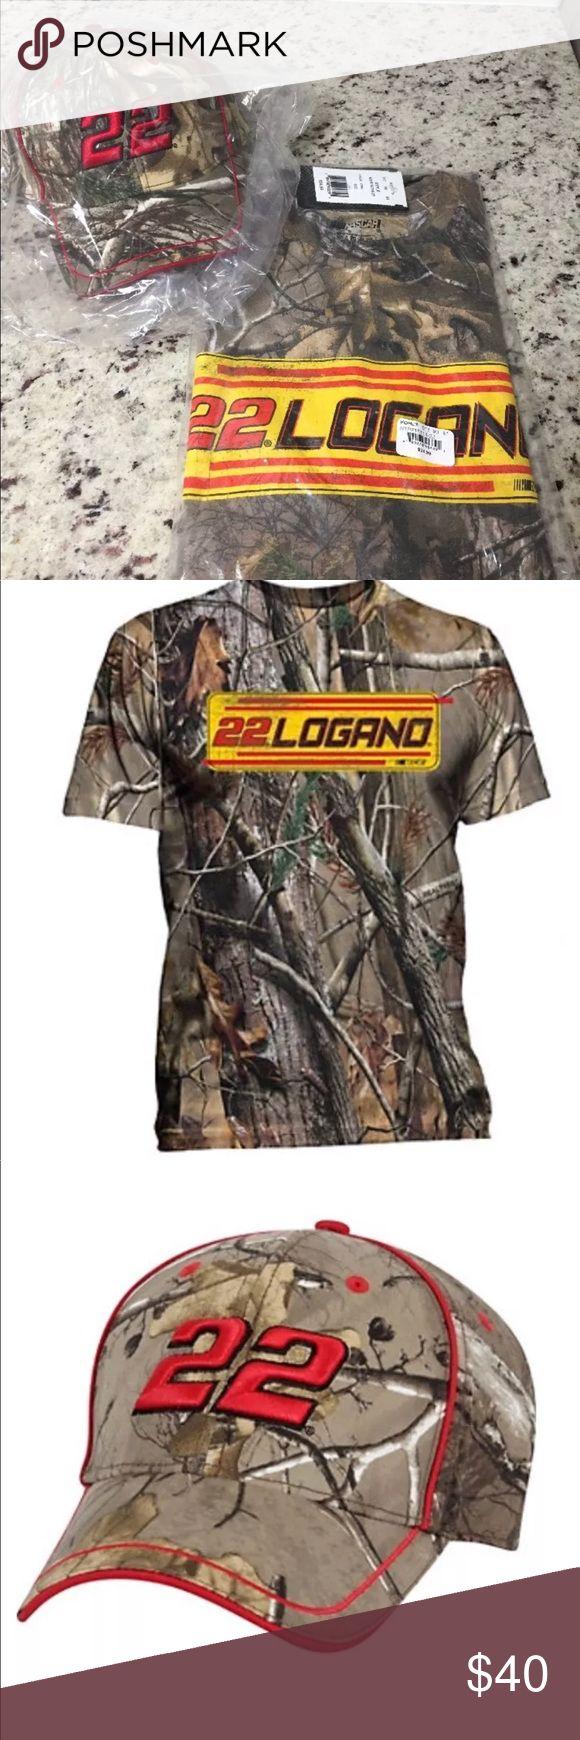 NASCAR T-Shirt and Hat New Shirts https://www.fanprint.com/stores/teeshirtstudio-fam?ref=5750